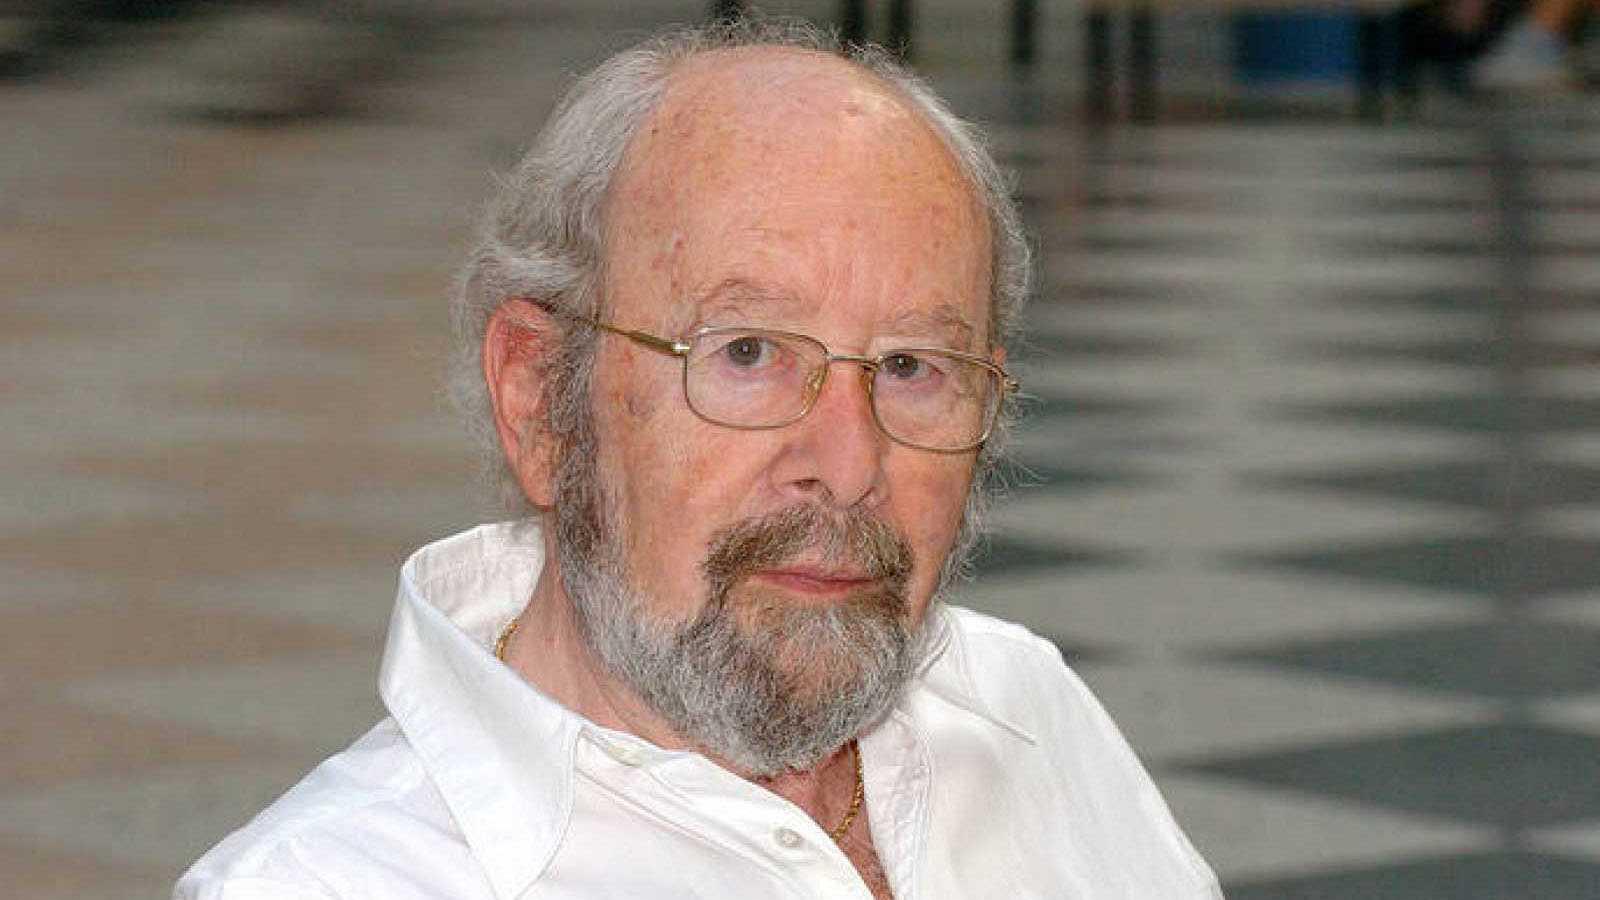 Emisión en árabe - José Manuel Caballero Bonald, Premio Cervantes - 06/04/21 - escuchar ahora